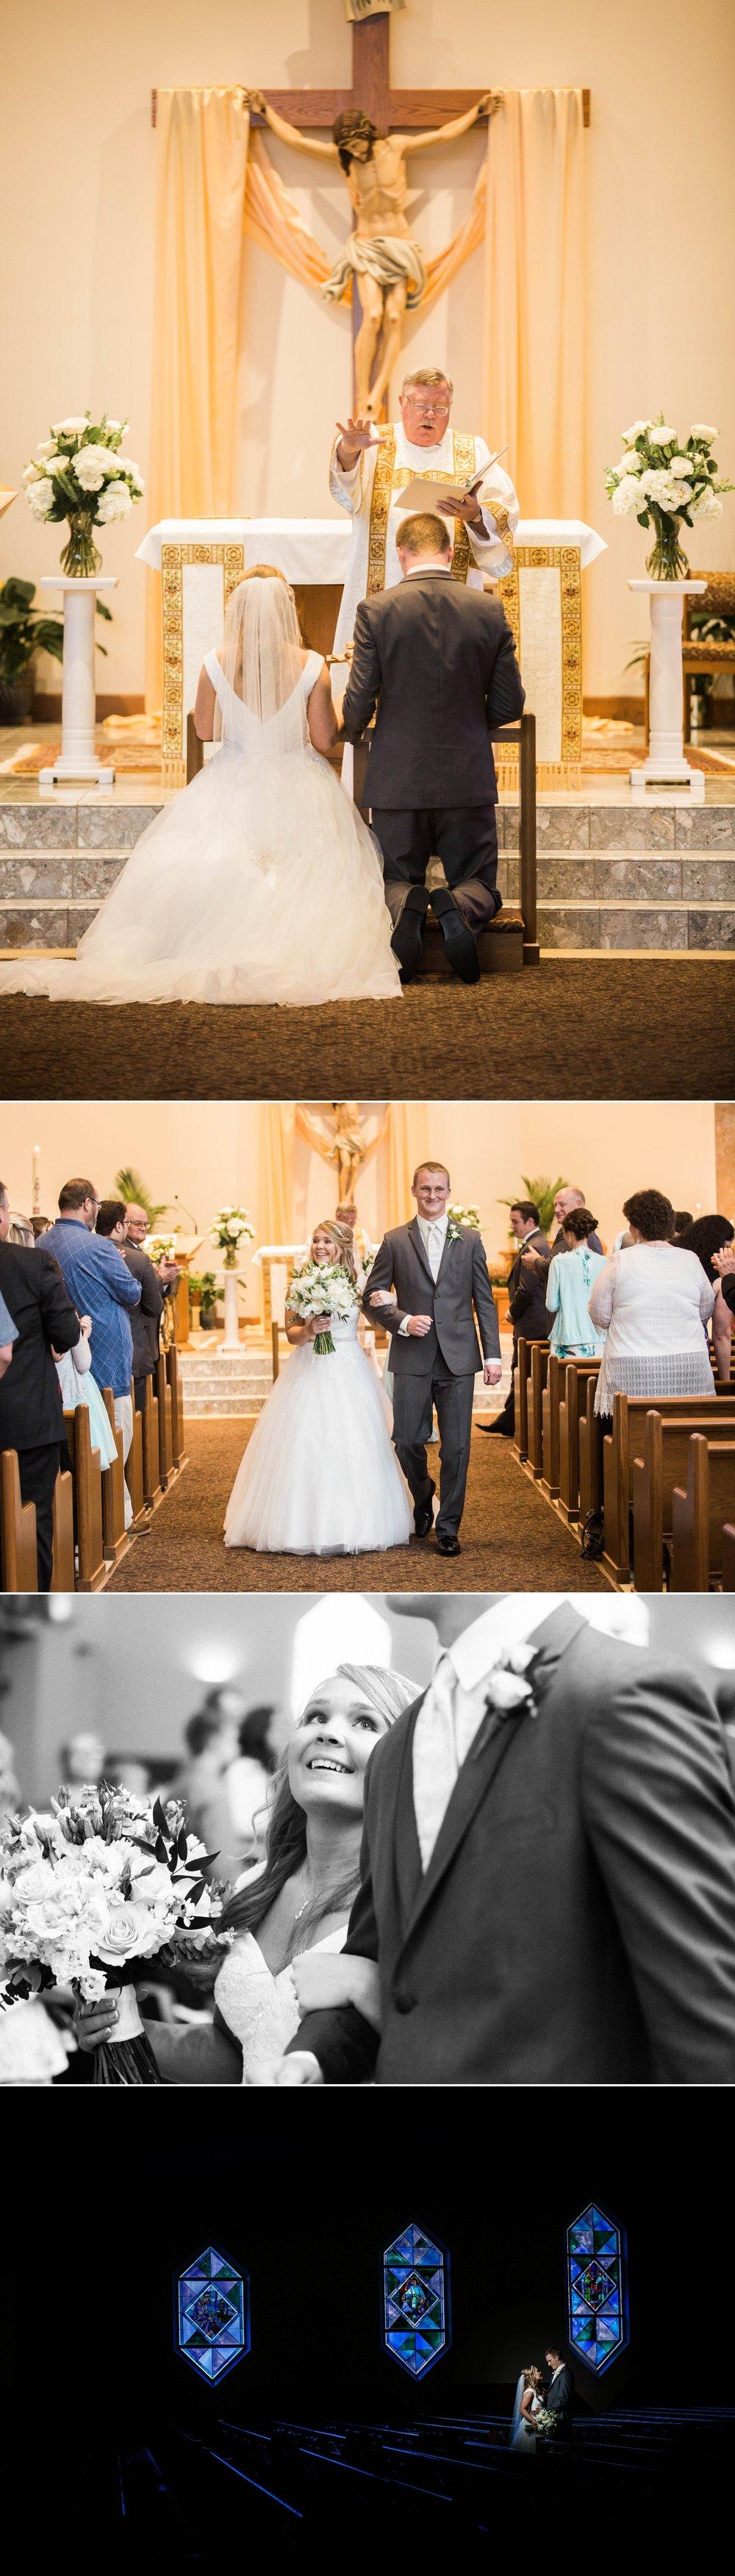 ceremony - wedding - church - bride - groom